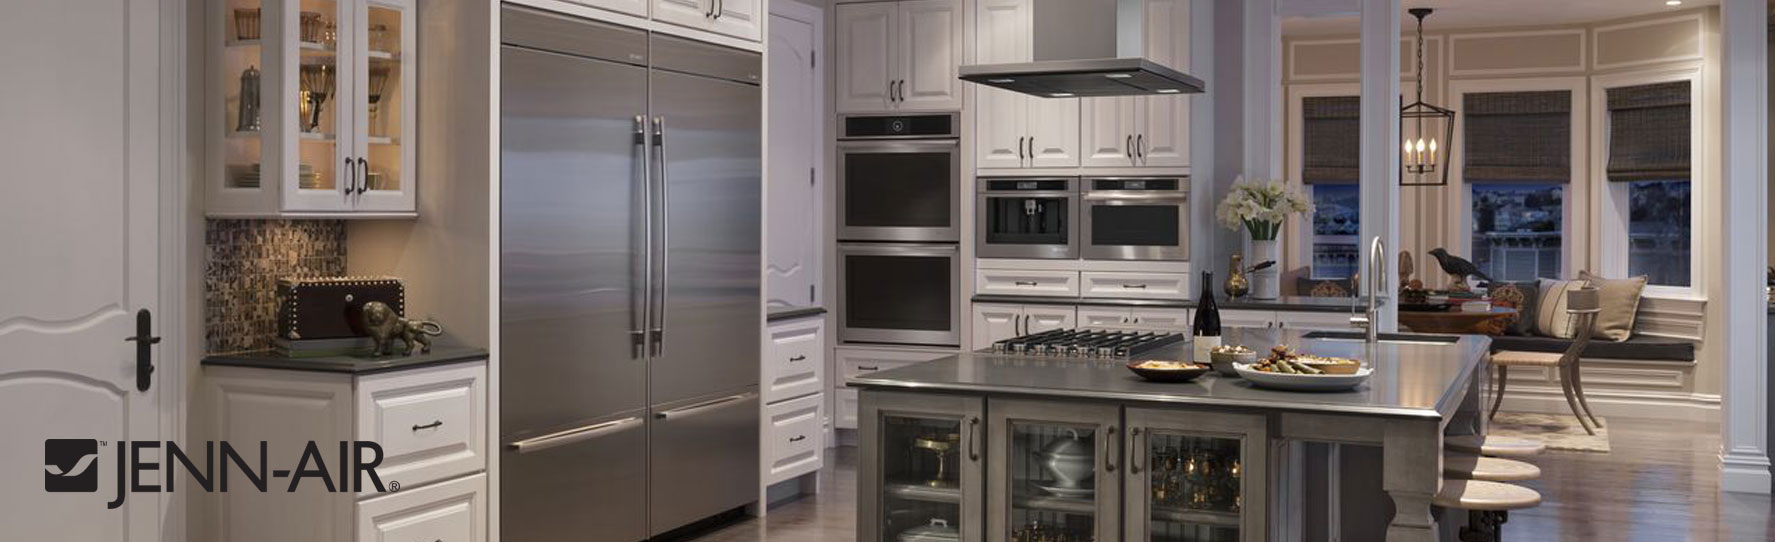 Cooking - Standard TV & Appliance